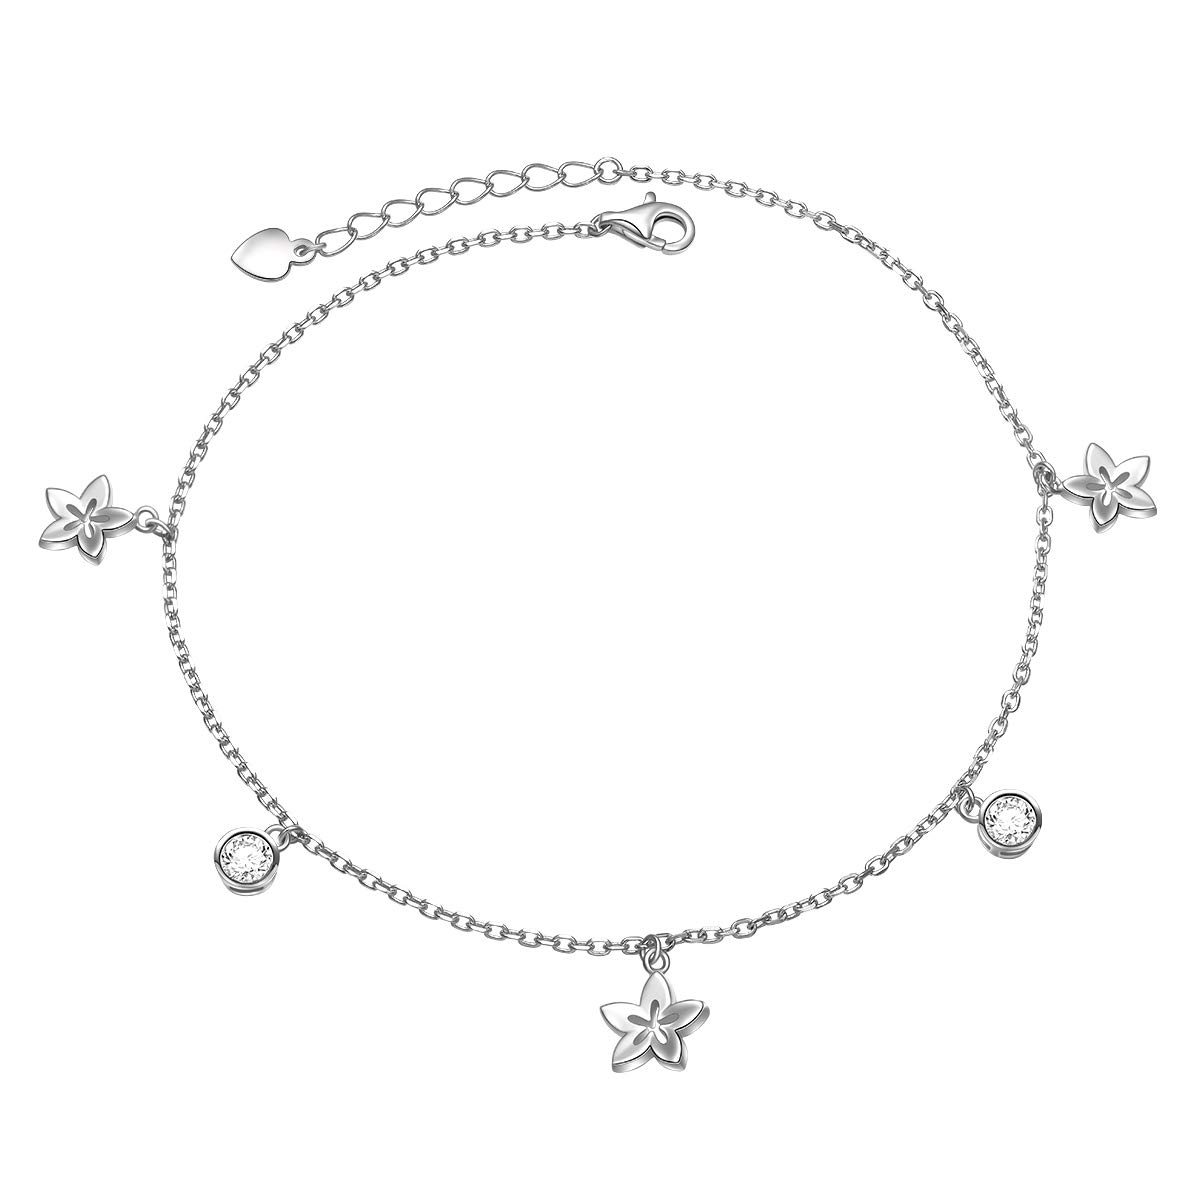 JZMSJF Anklet Bracelet for Women 925 Sterling Silver Flower Pendant Anklet Chain CZ Foot Anklet Bracelet Summer Beach Jewelry for Women Girls,Length Adjustable